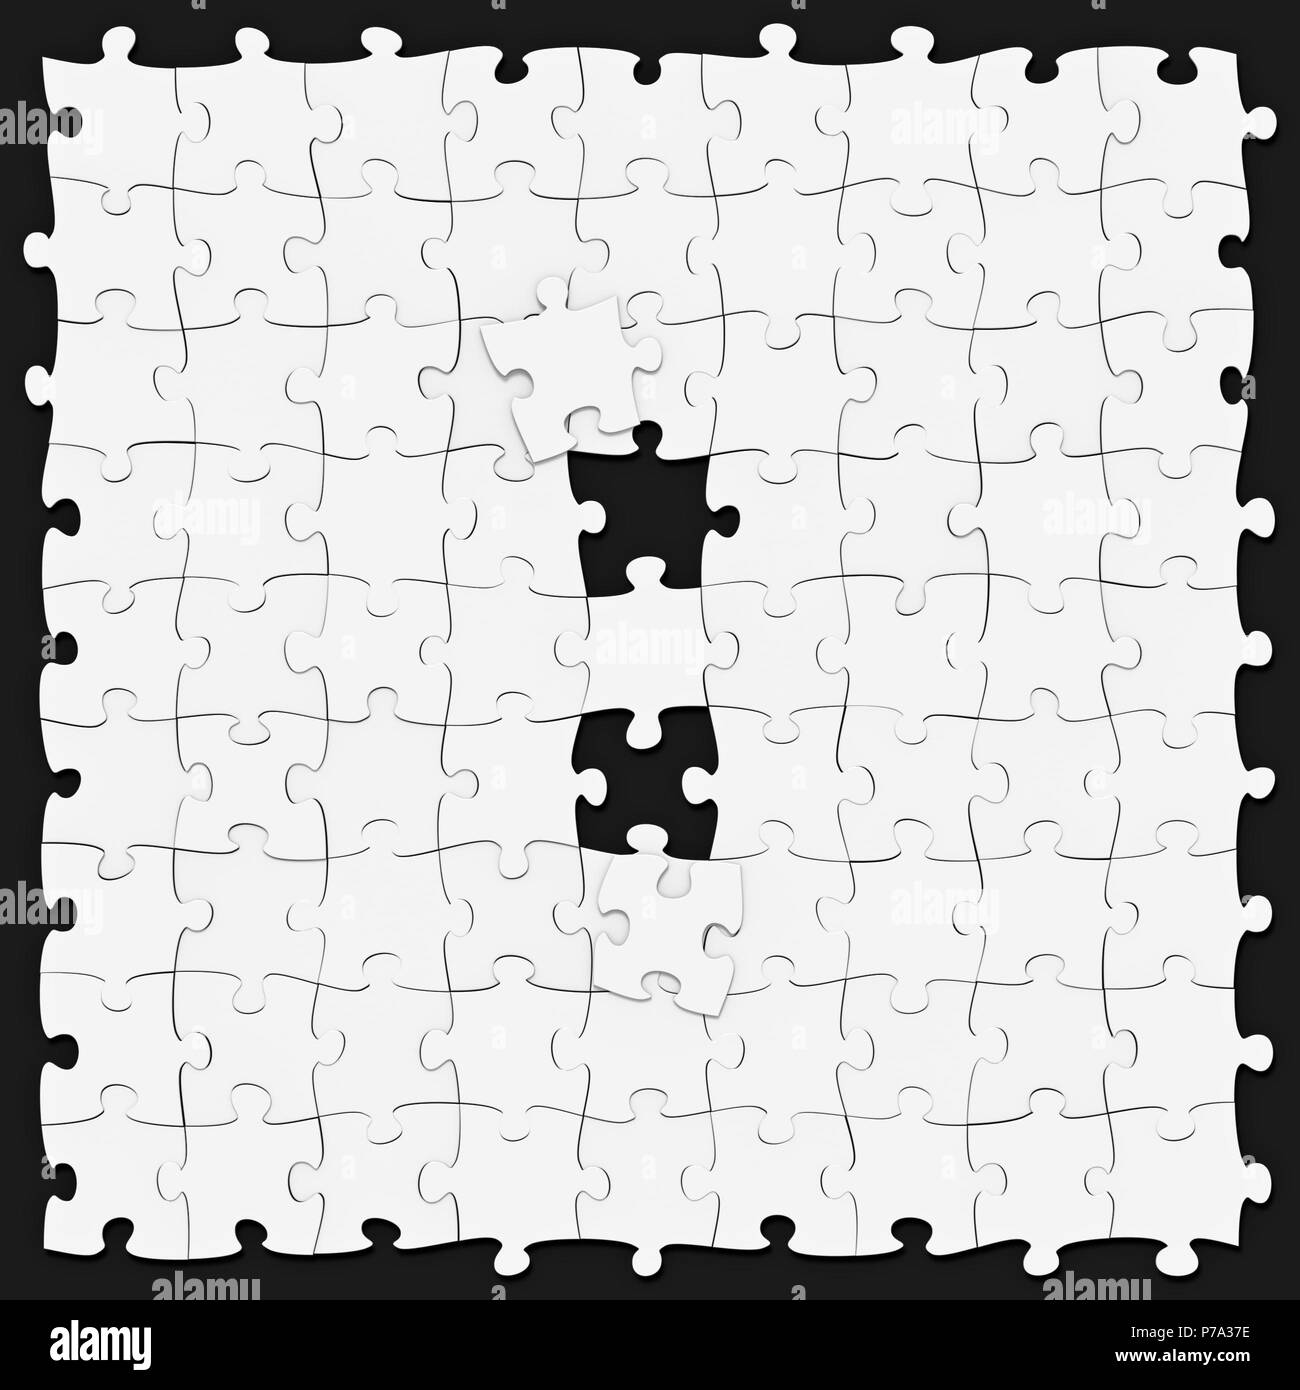 Jigsaw Puzzles Assembled Like Mathematical Operation Symbol Of